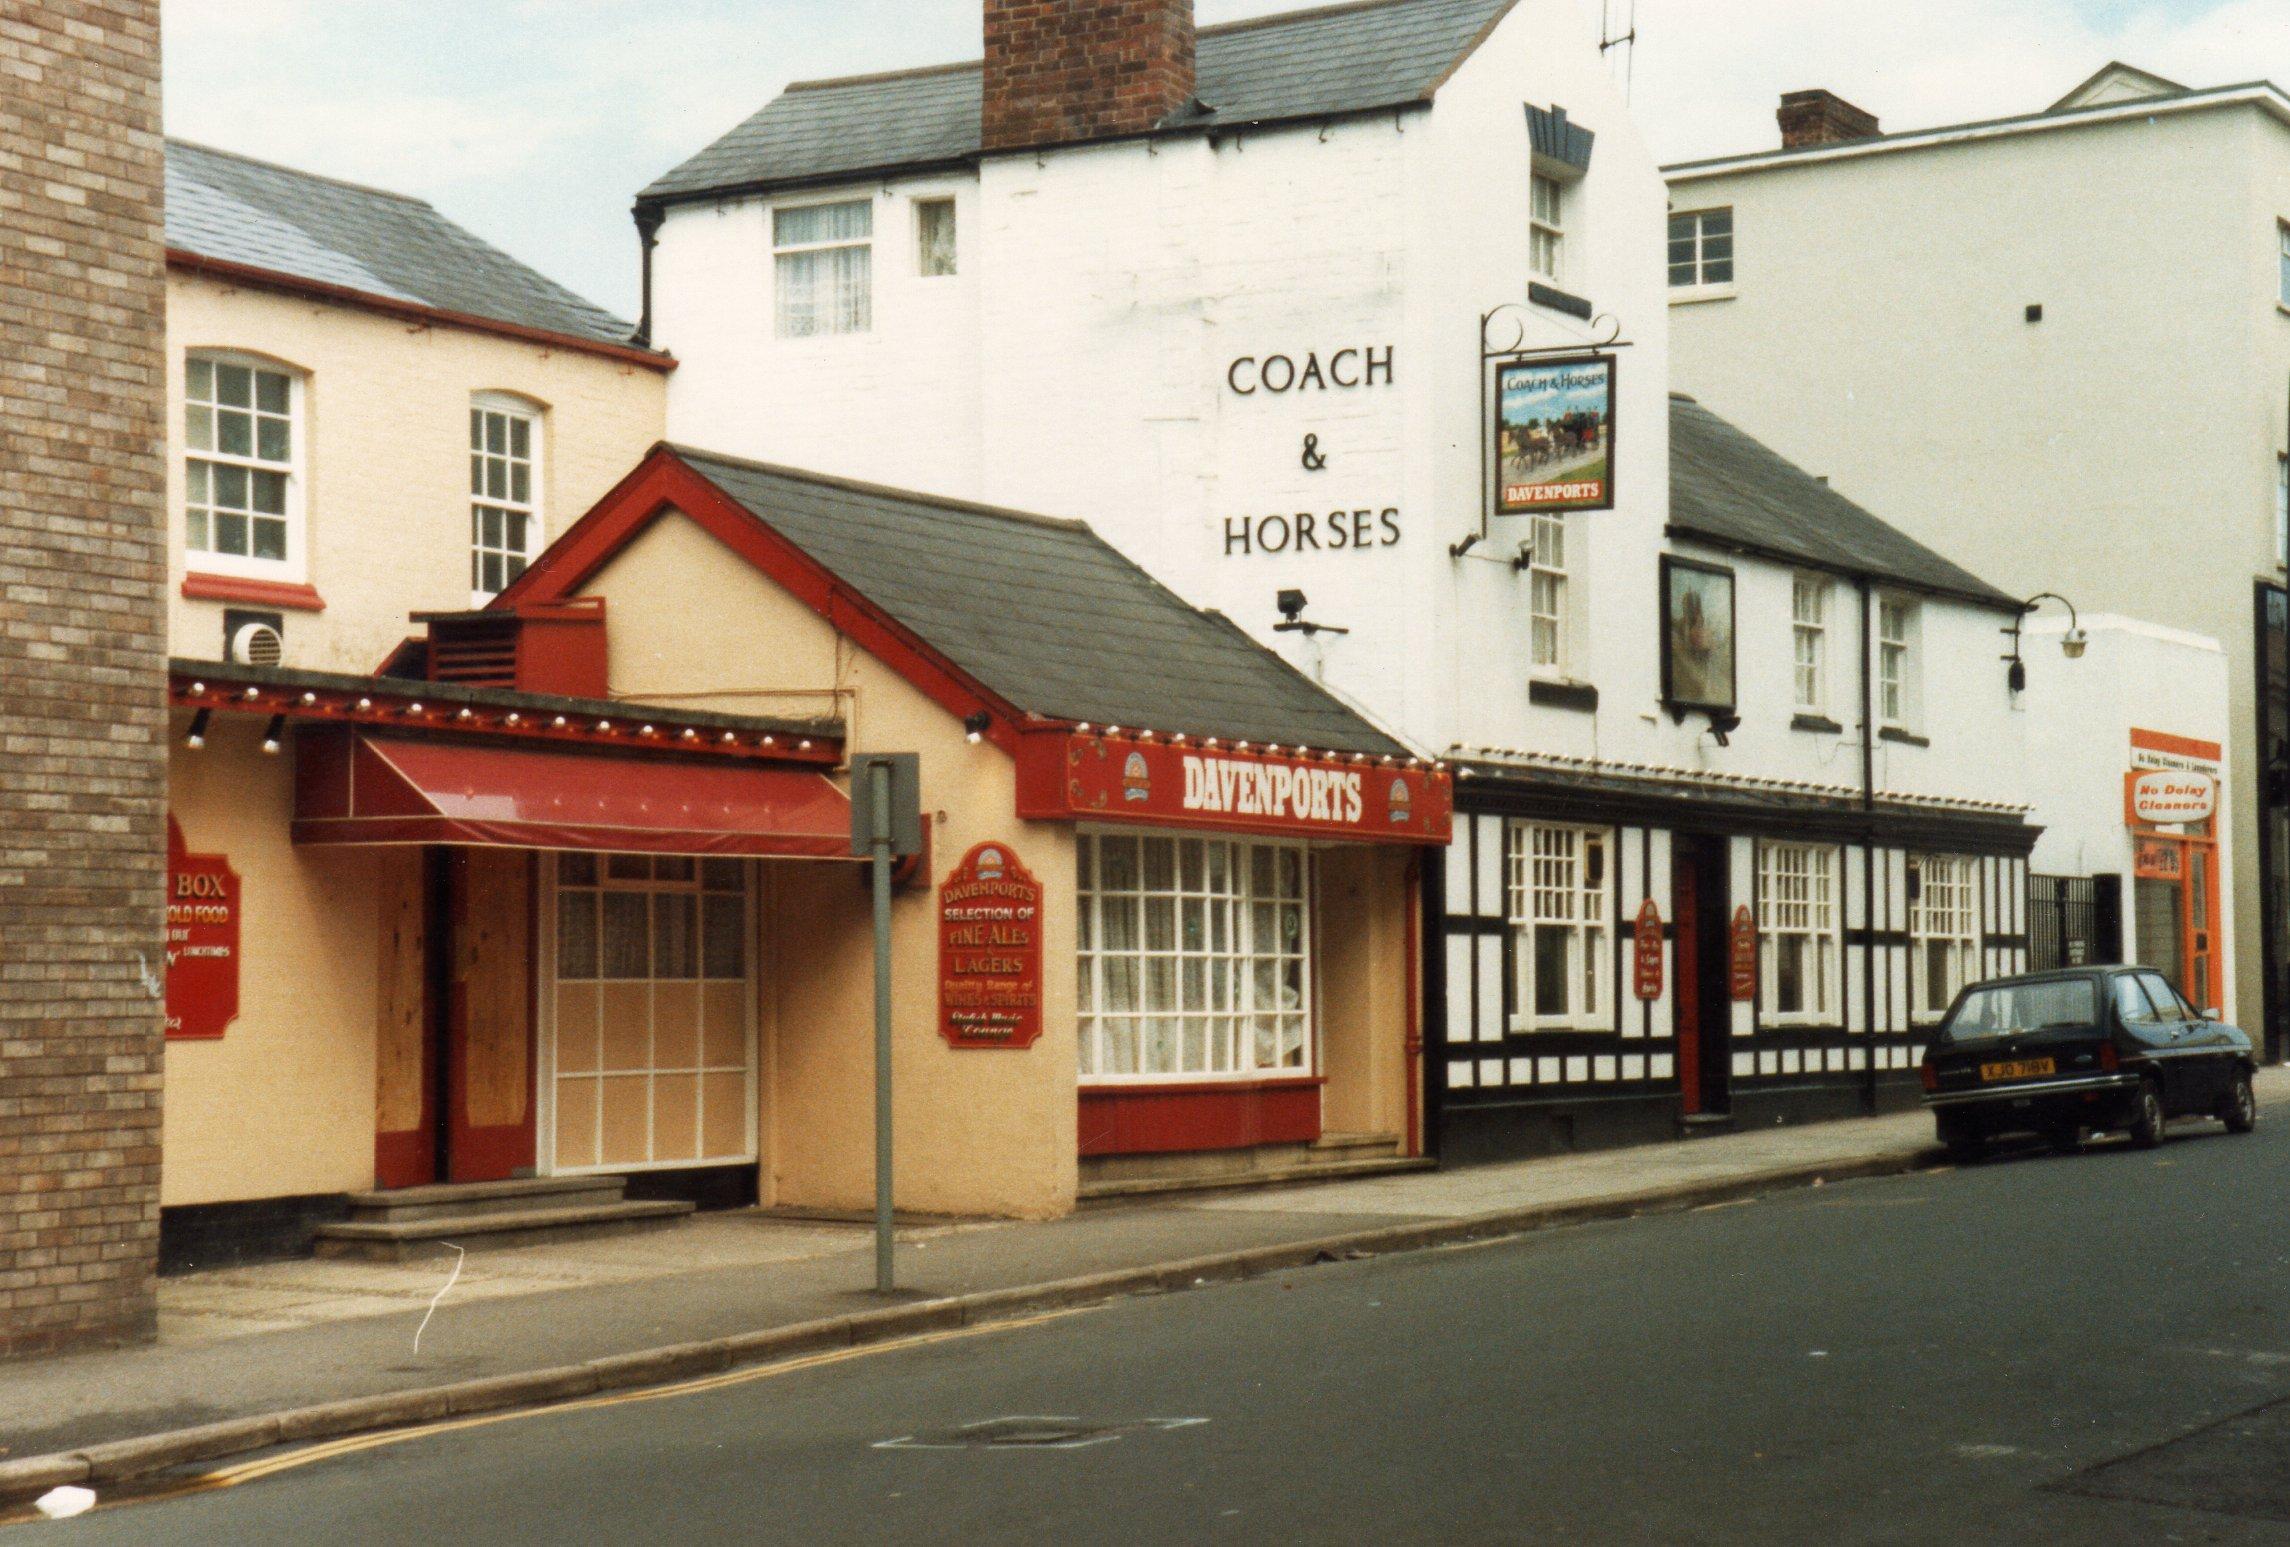 The Coach & Horses